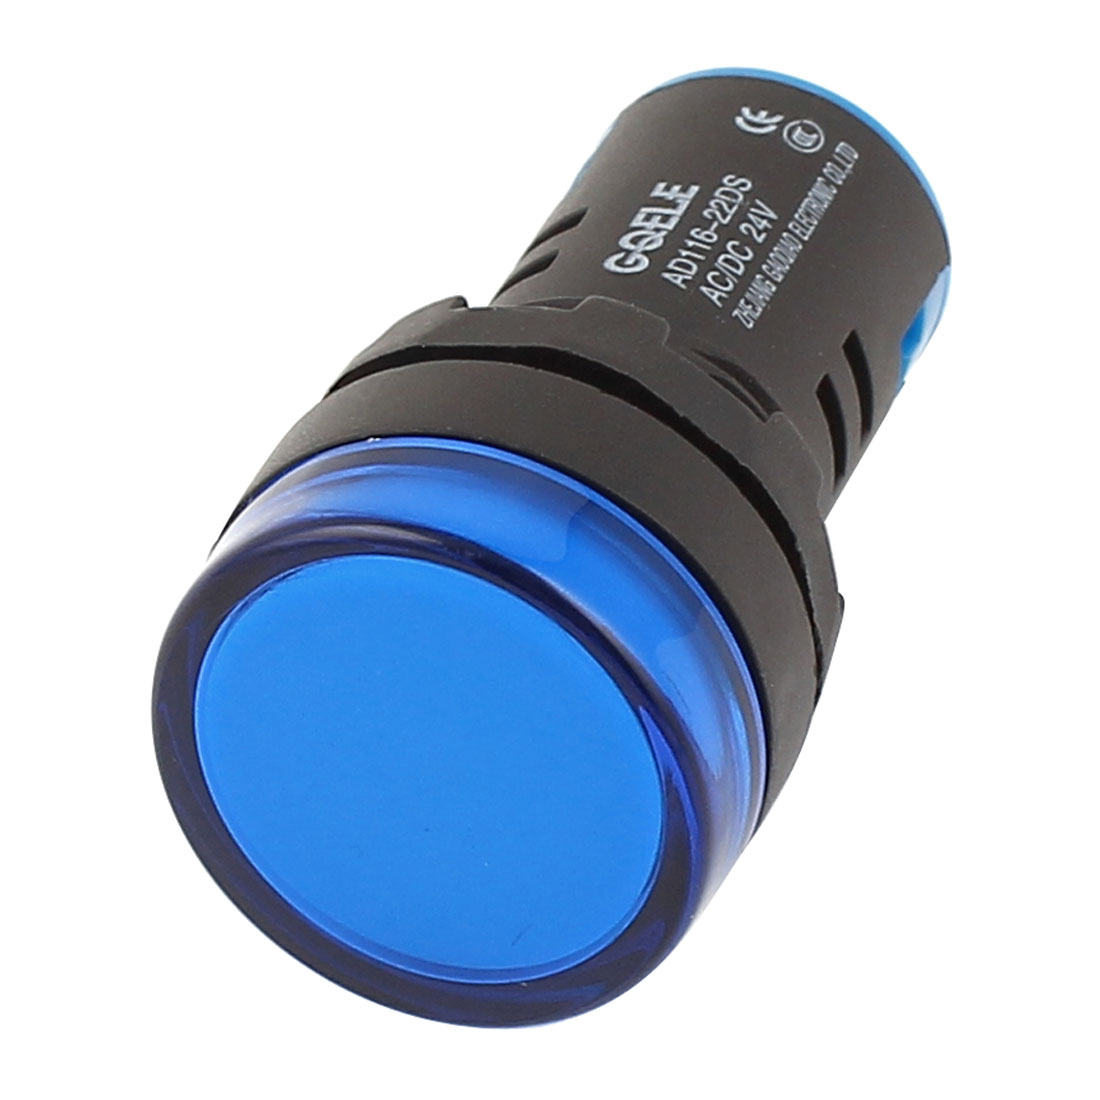 AD116-22DS AC/DC 24V 20mA Energy Saving LED Indicator Light Blue